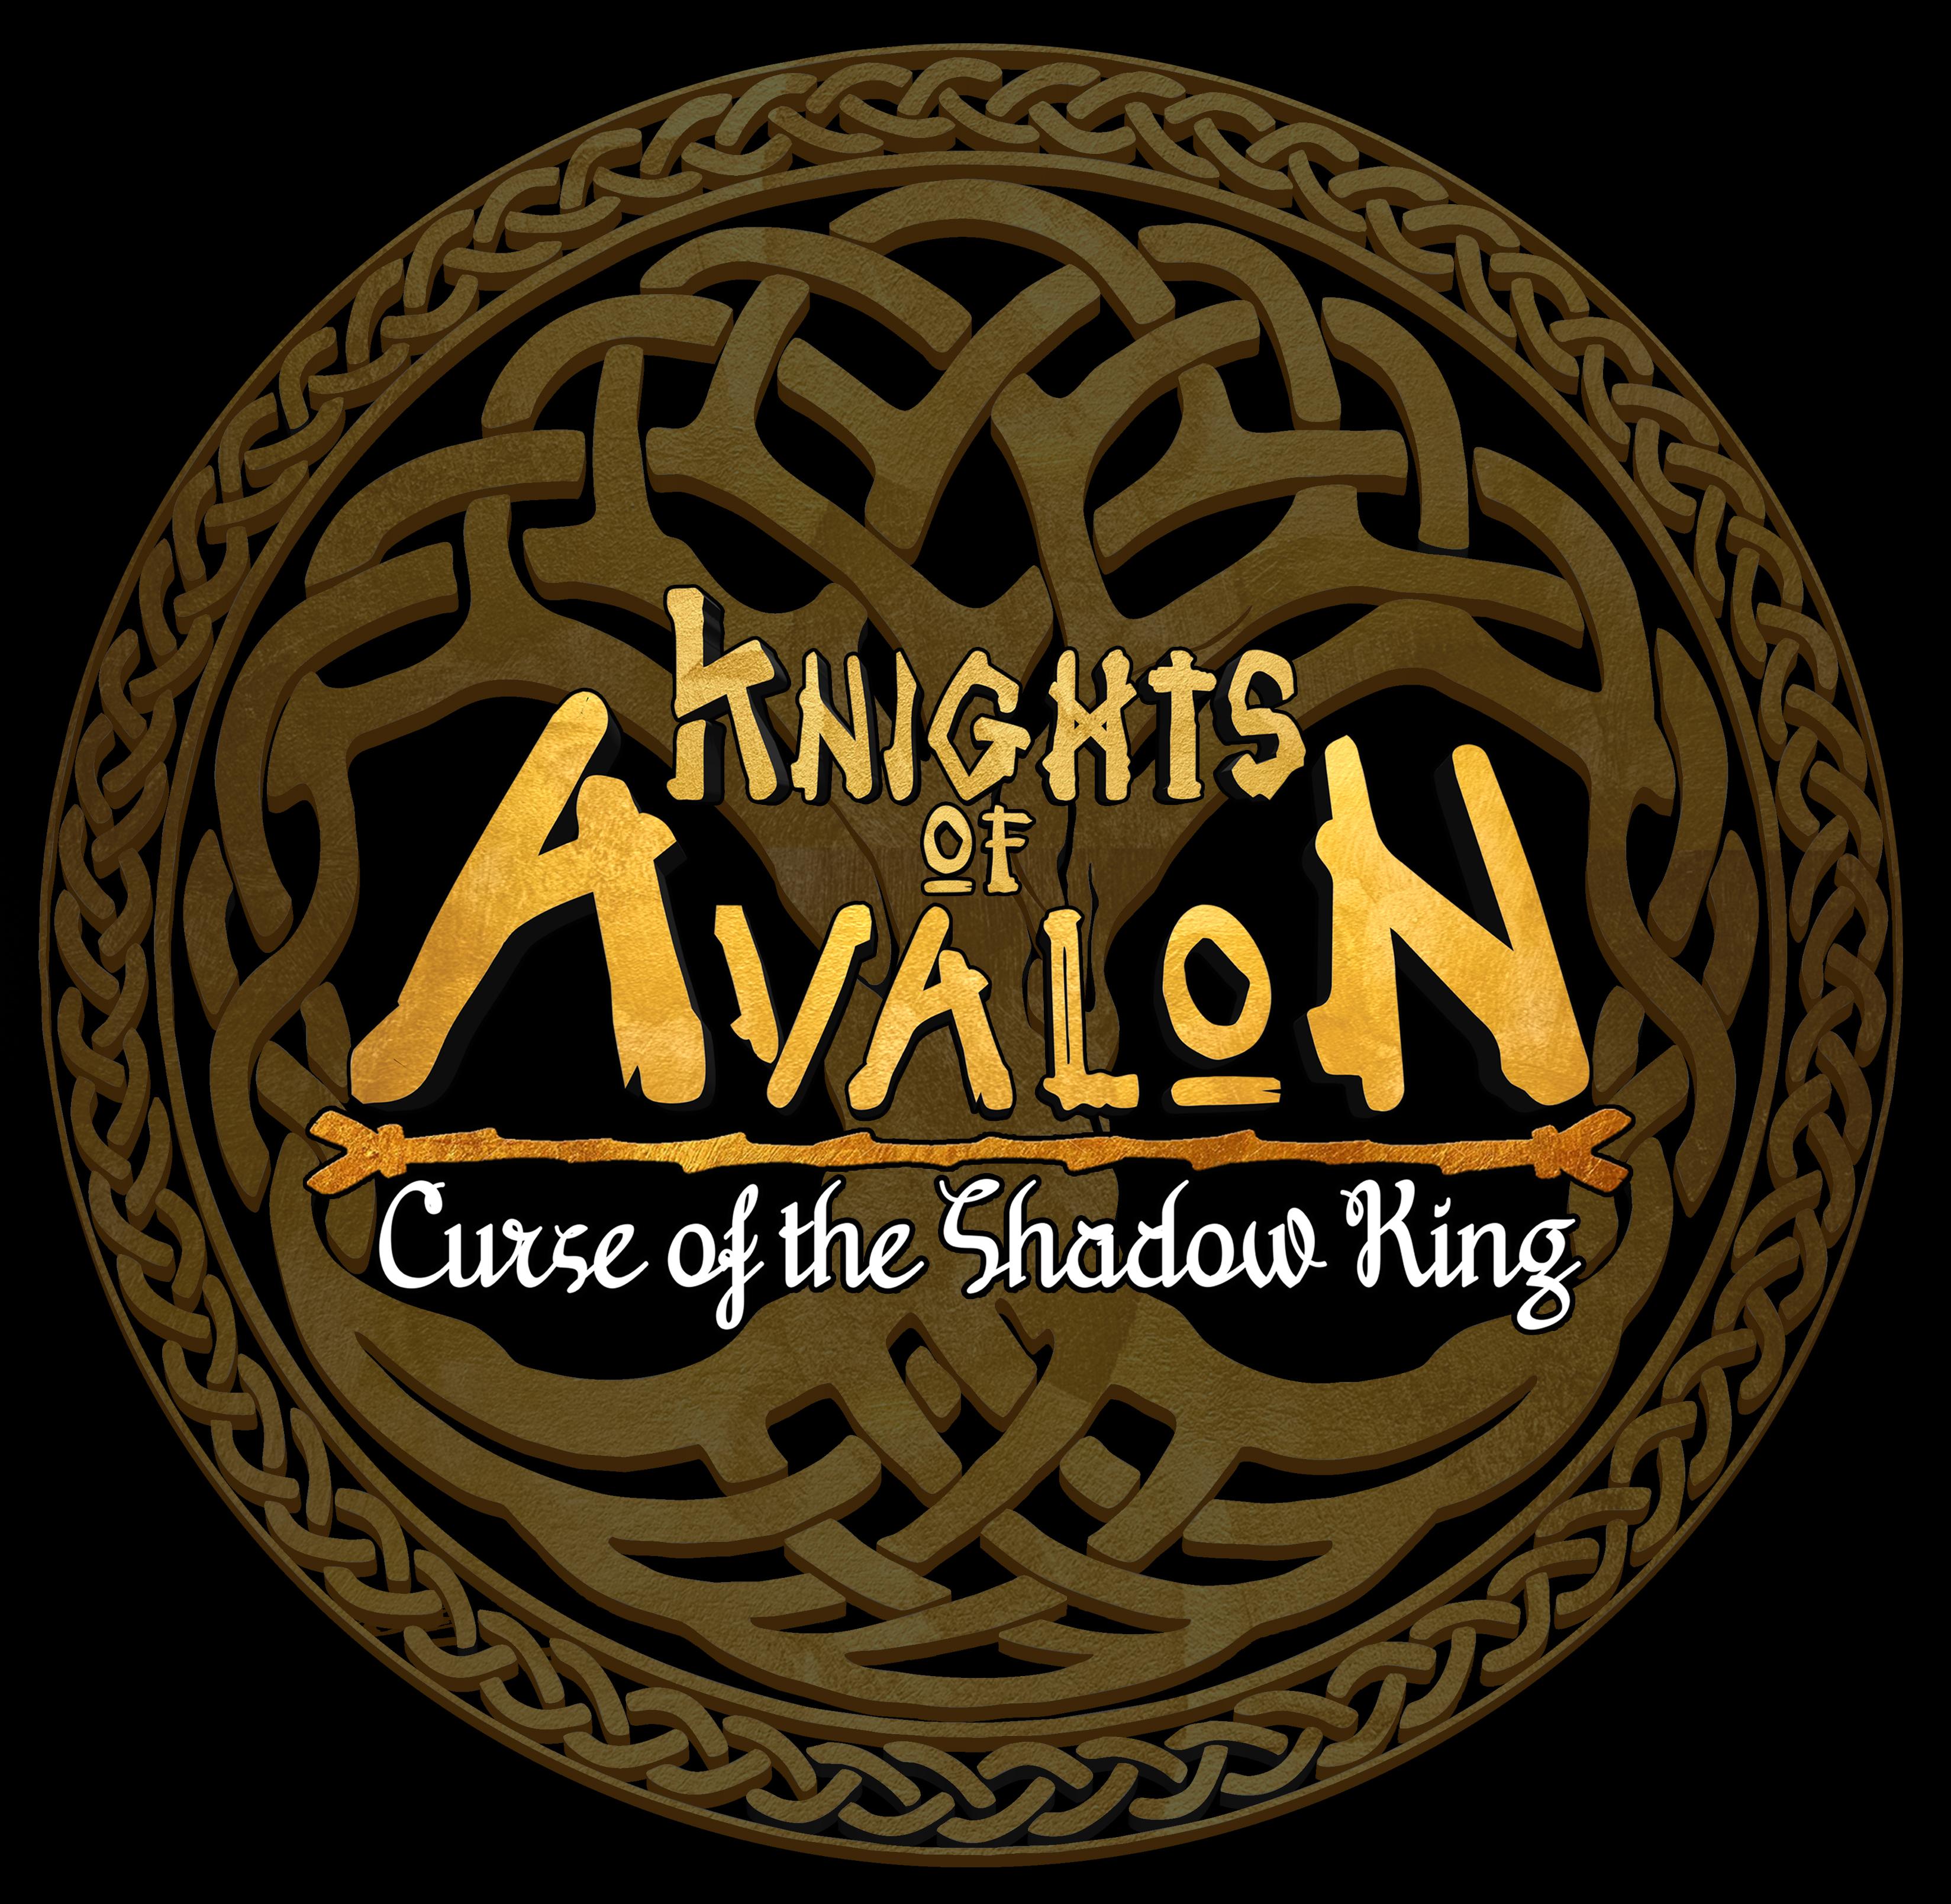 web site AVALON TREE WITH LOGO